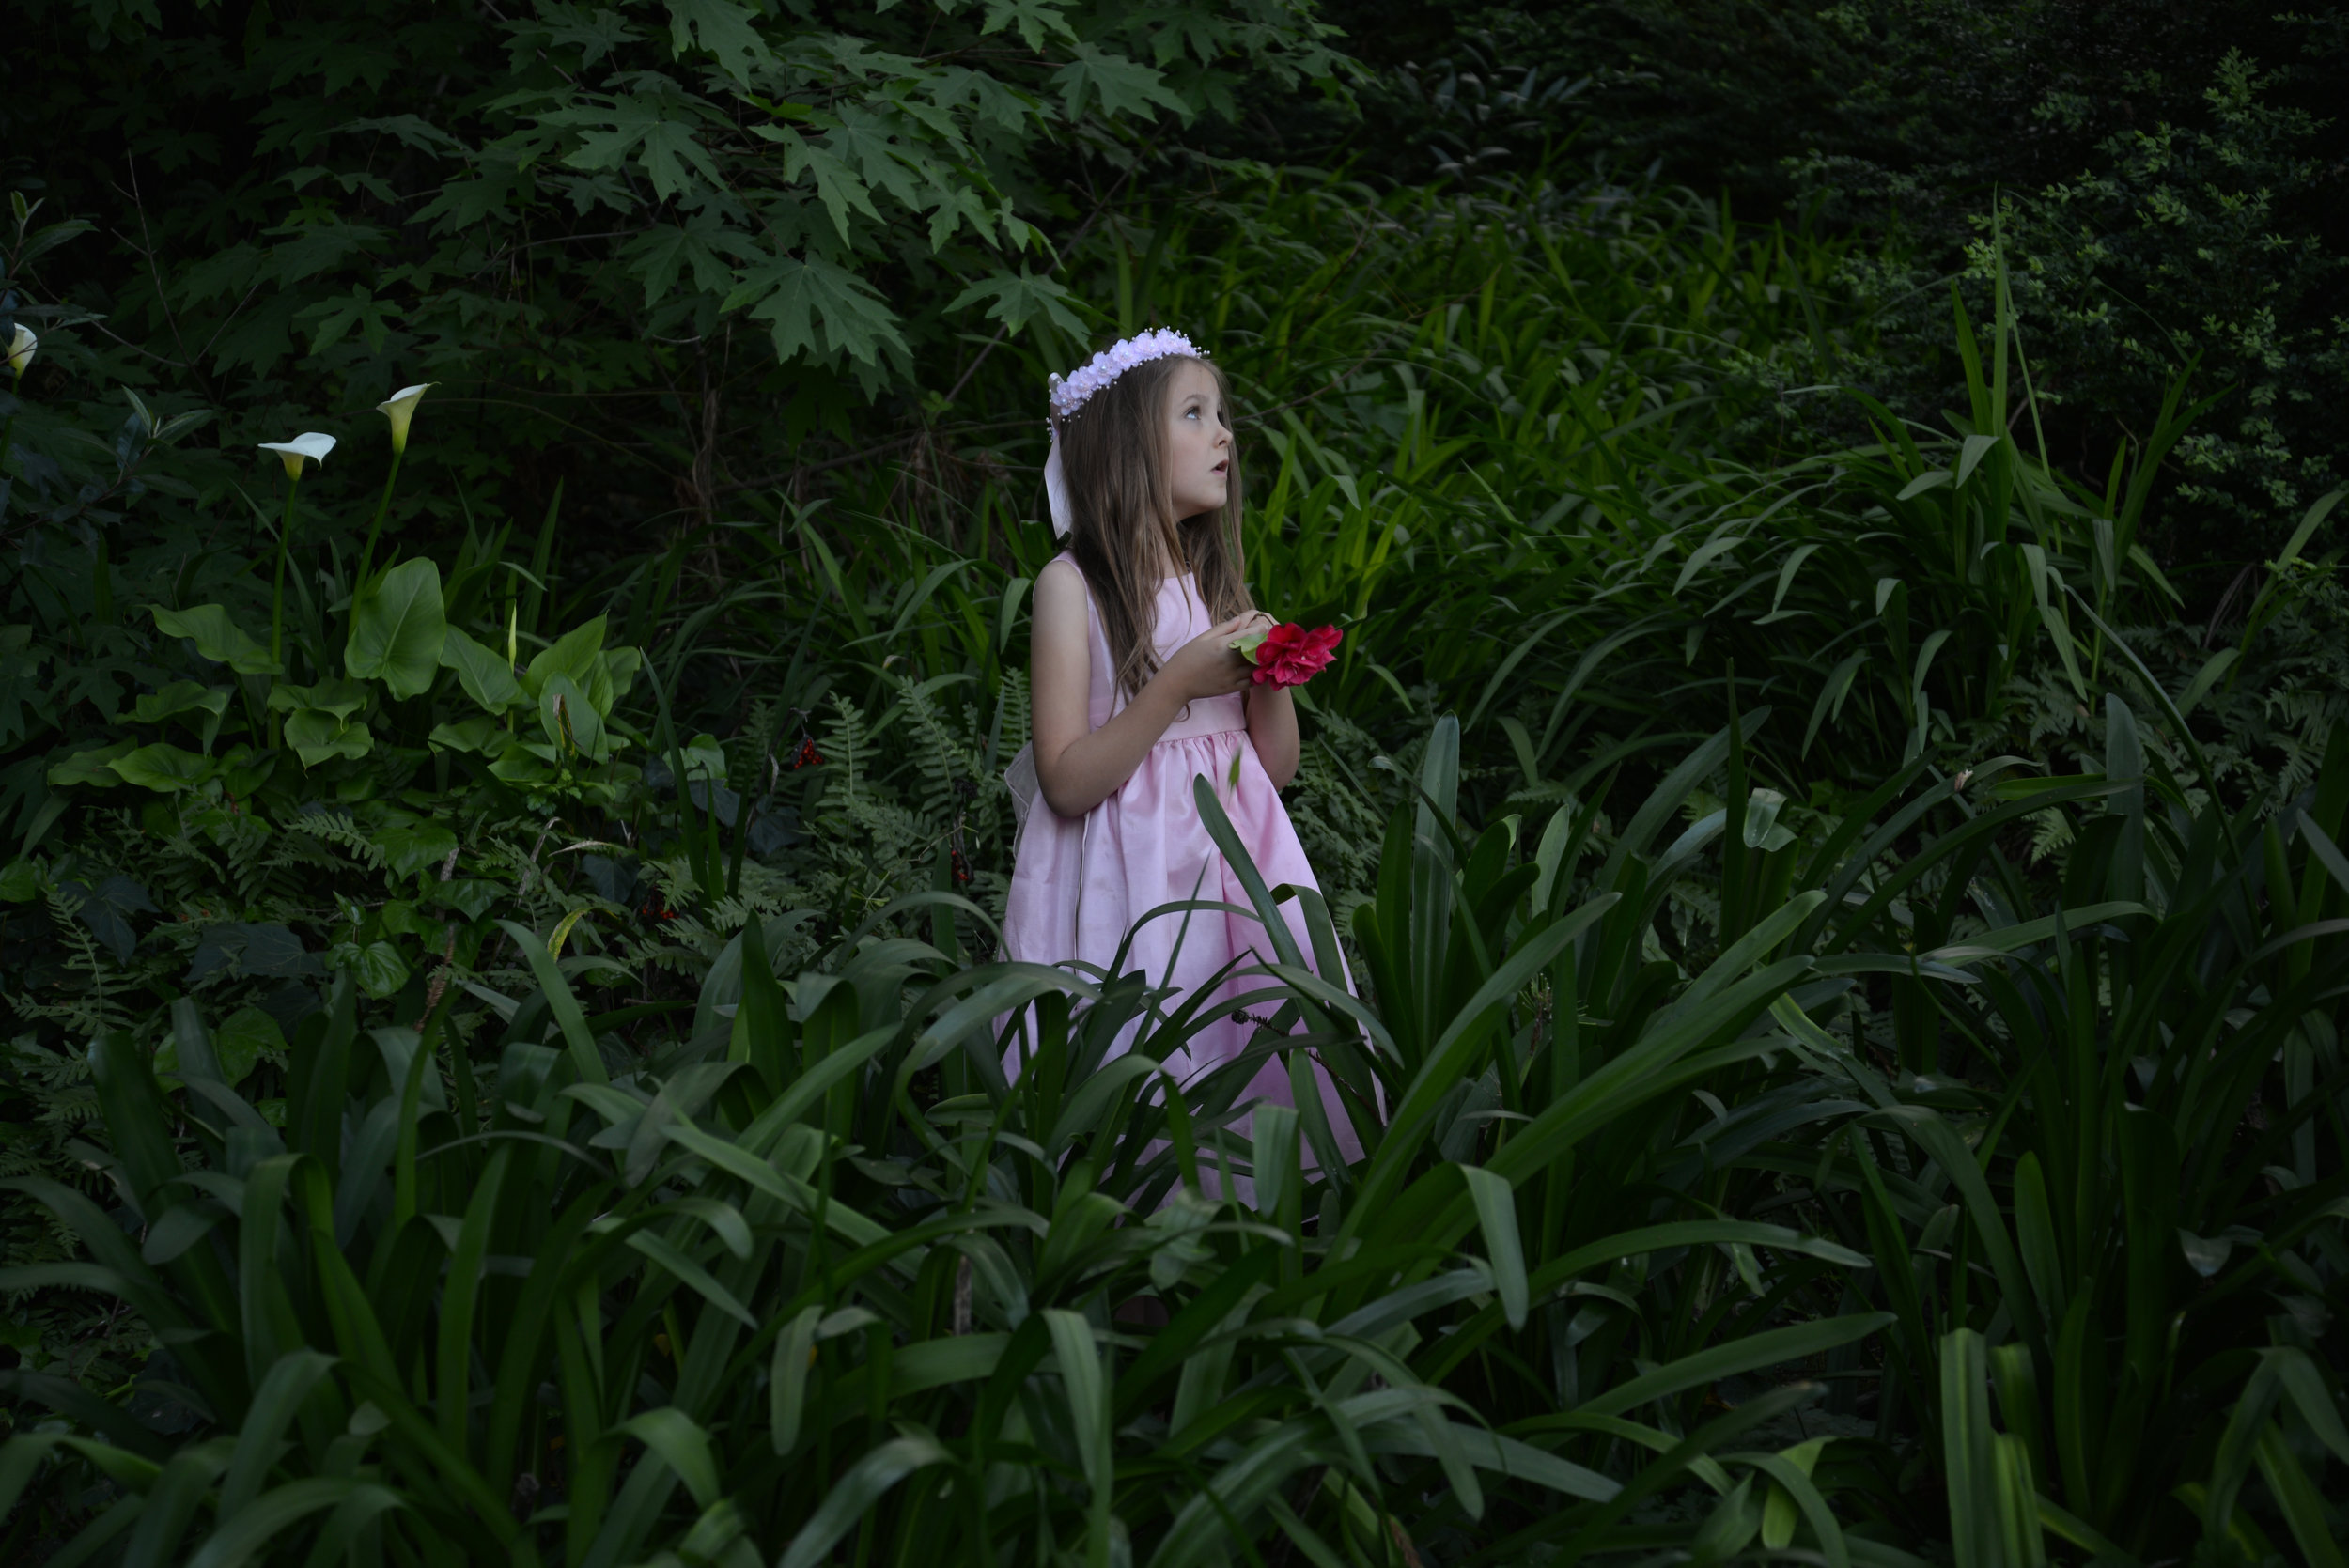 4-Polly-bridesmaid-3-6894.jpg